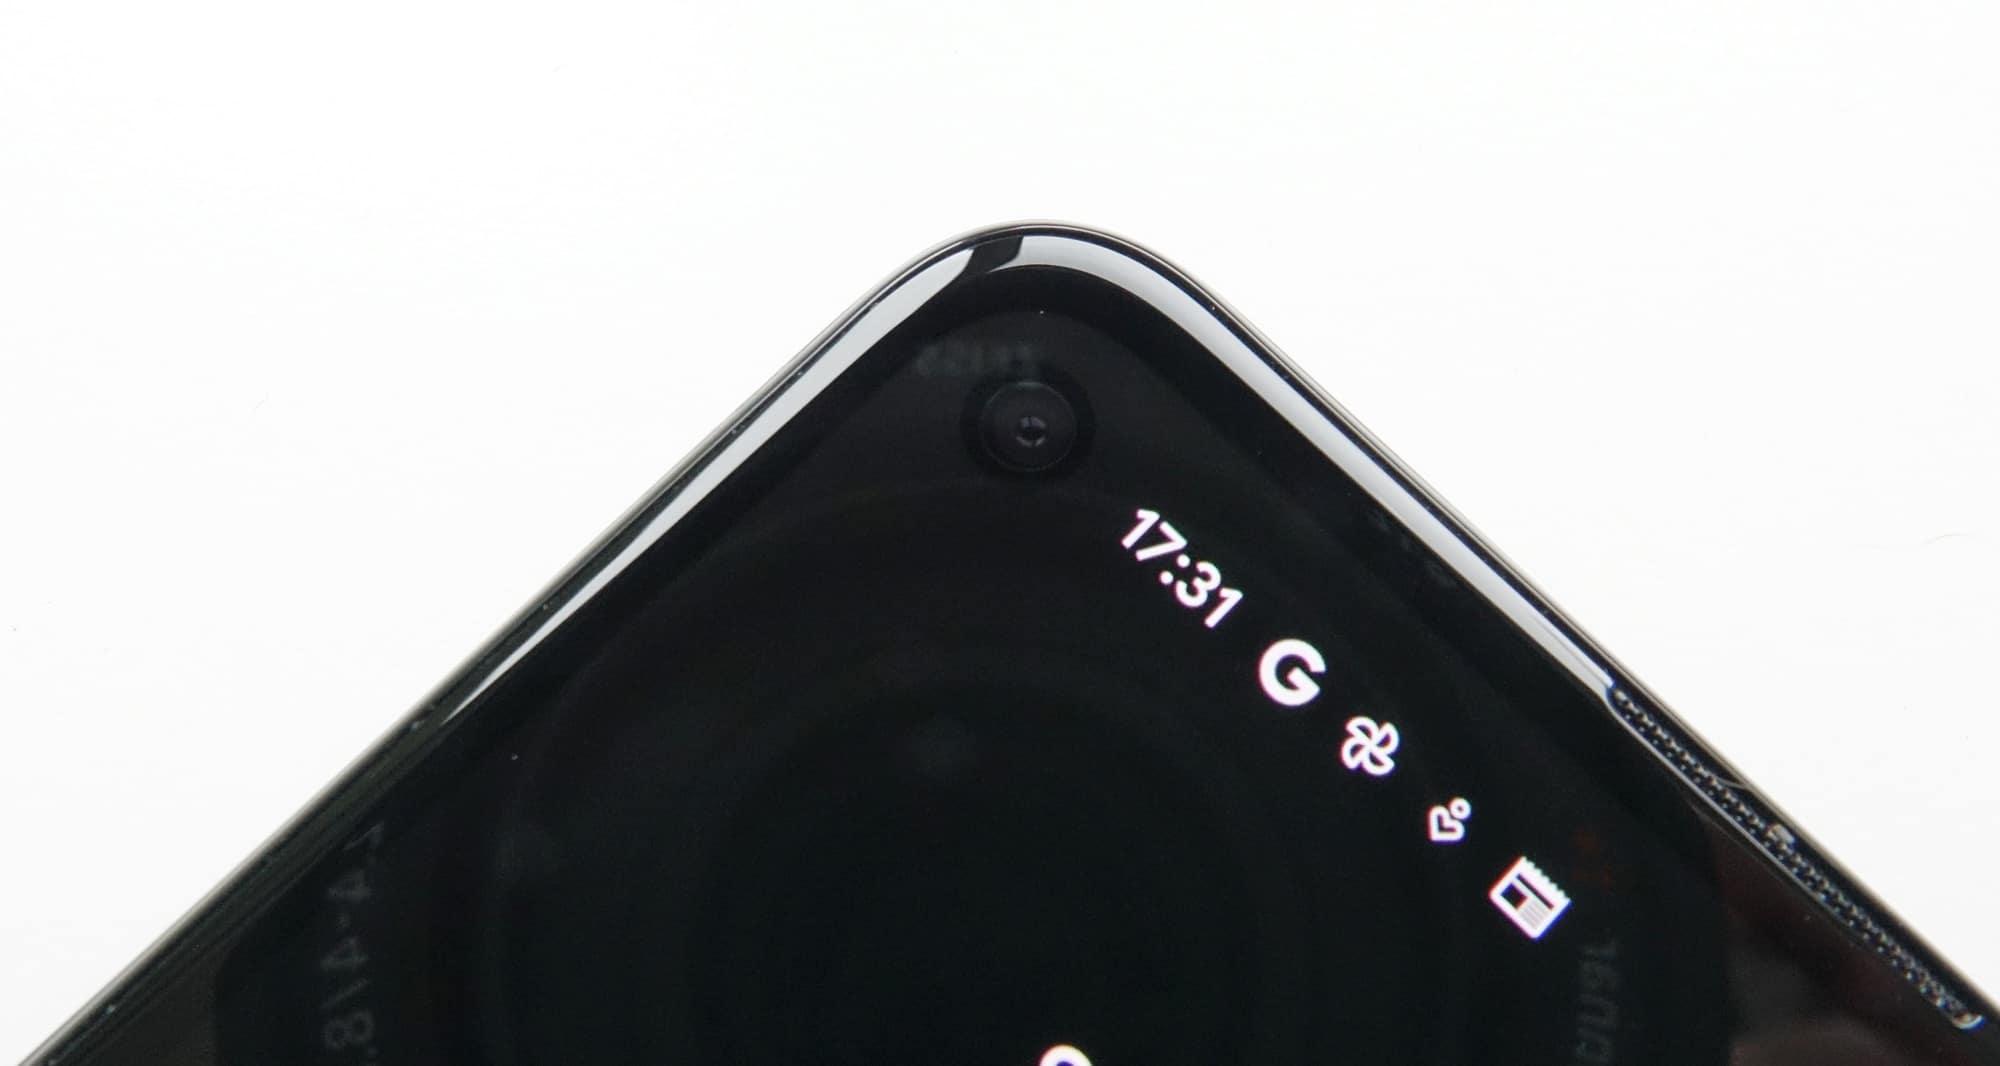 Google Pixel 4a (5G) selfie camera